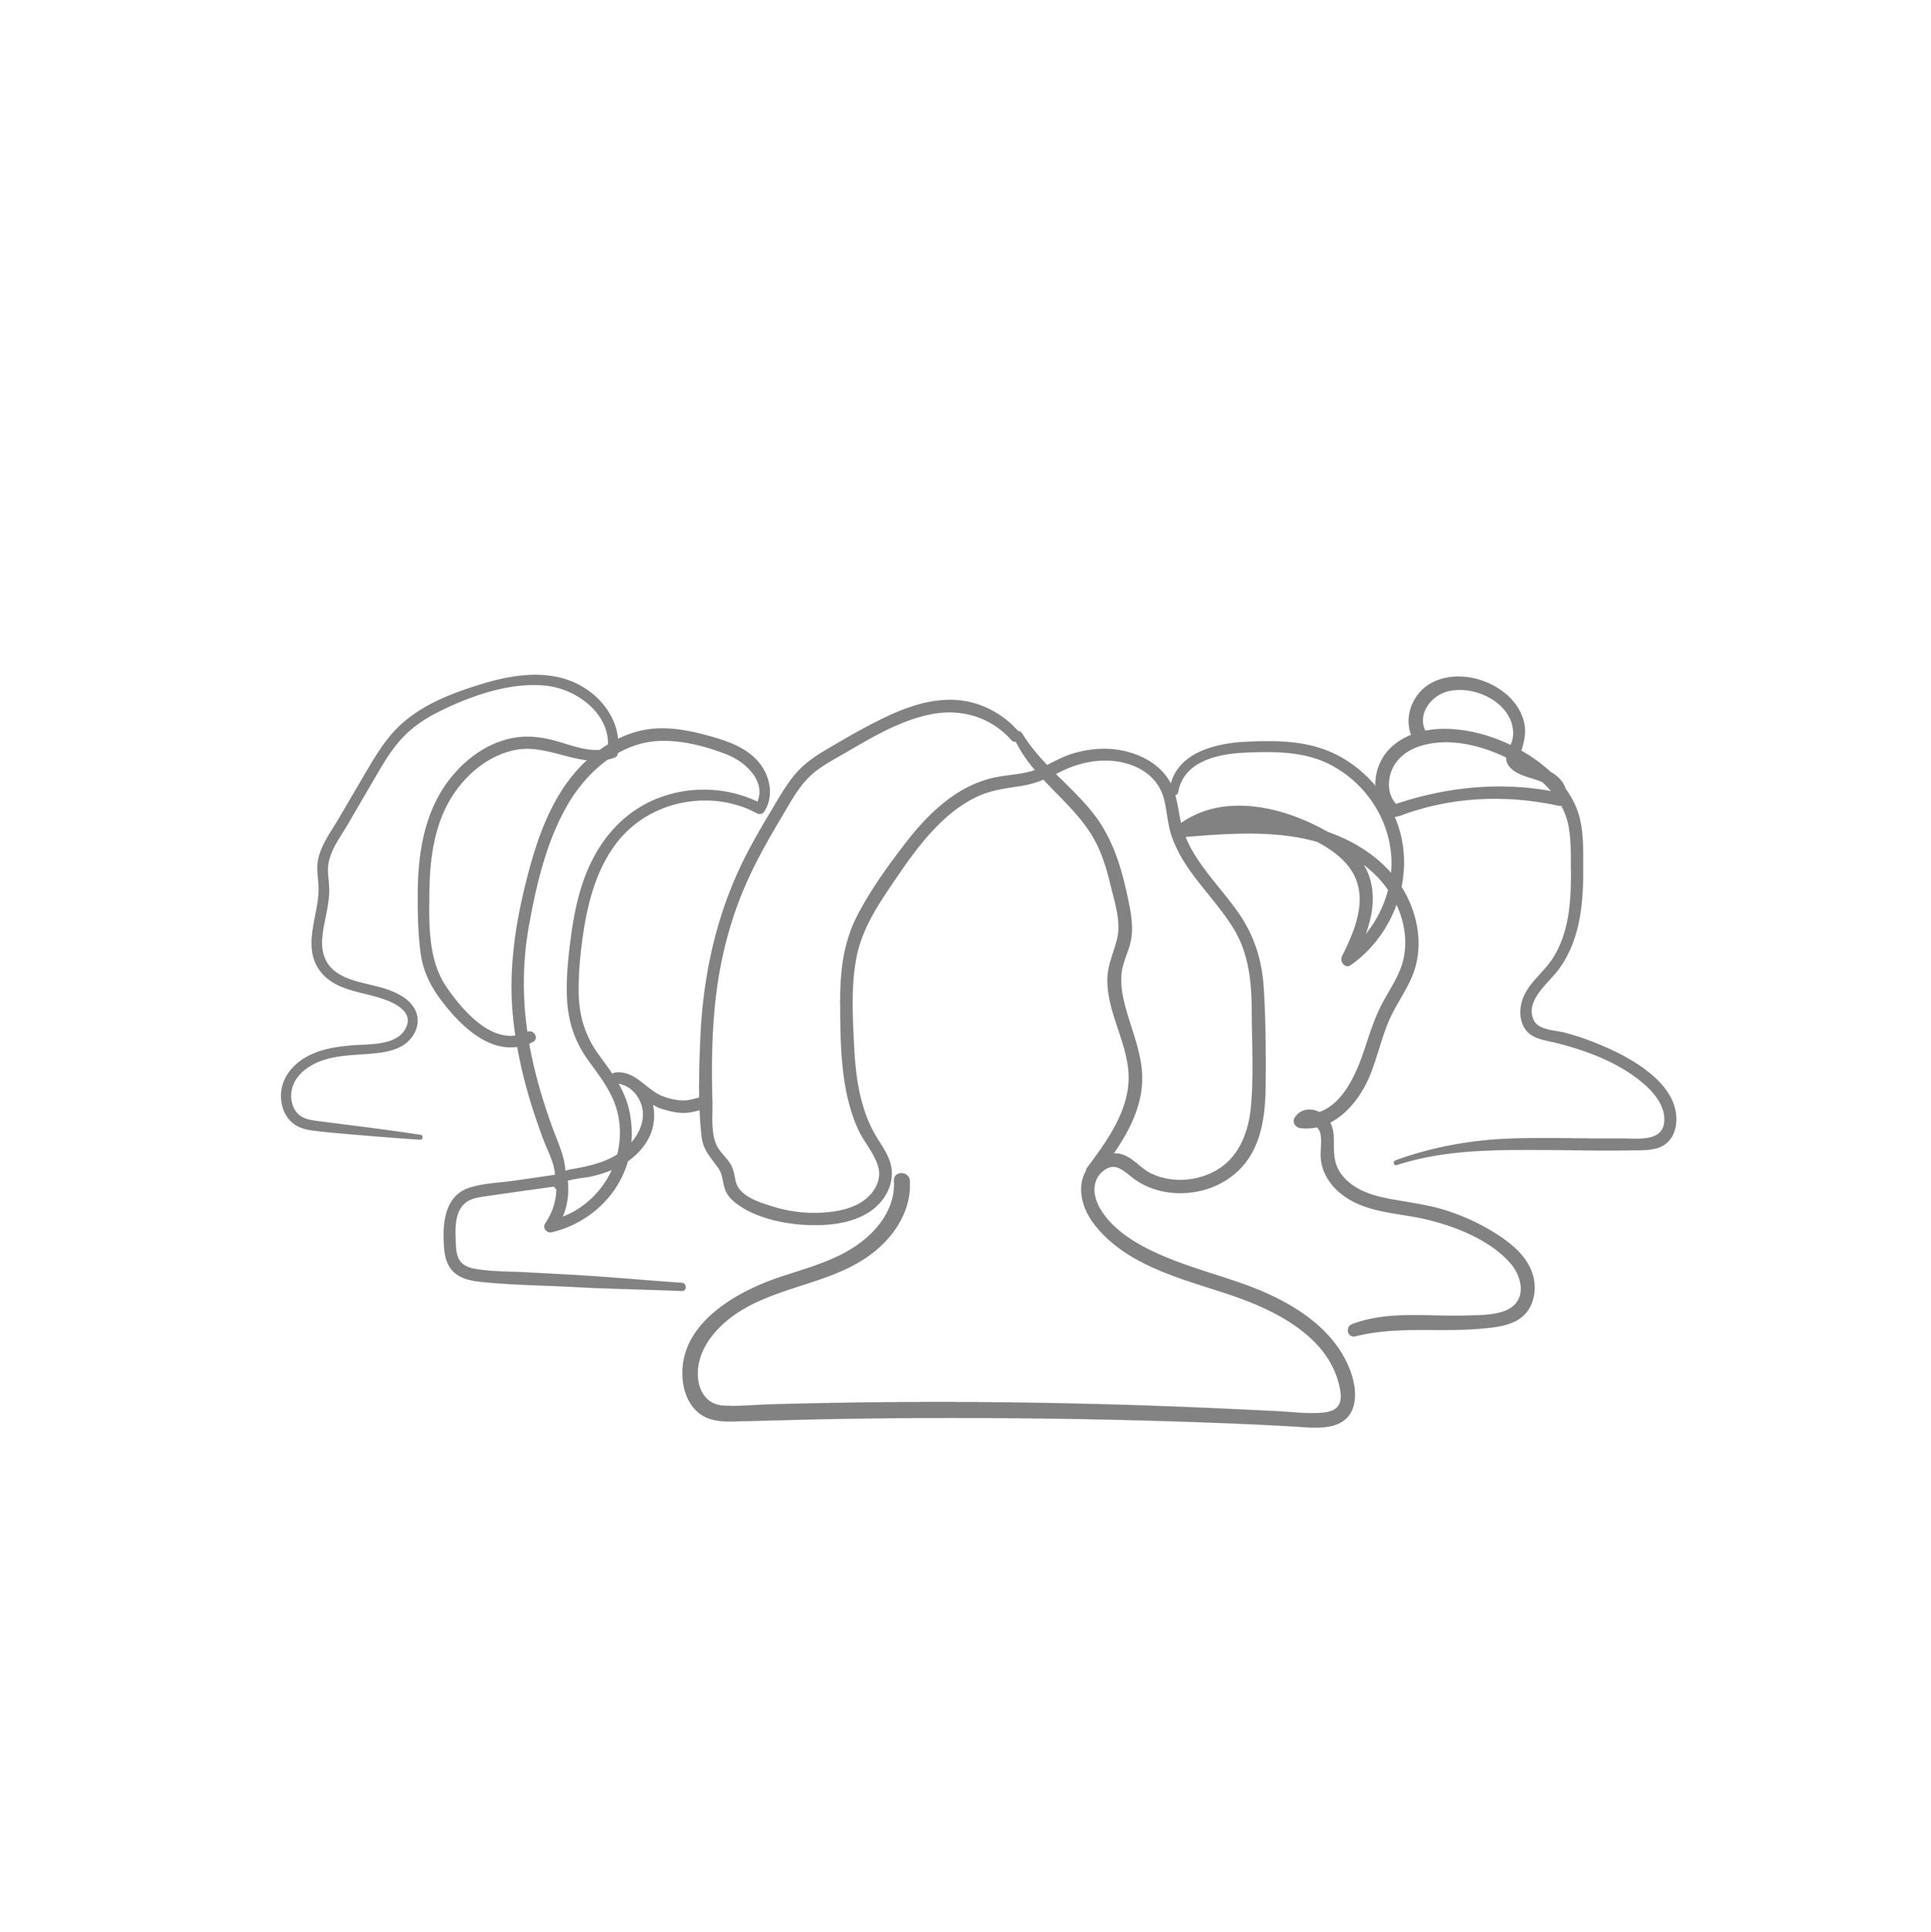 doodles-11.png